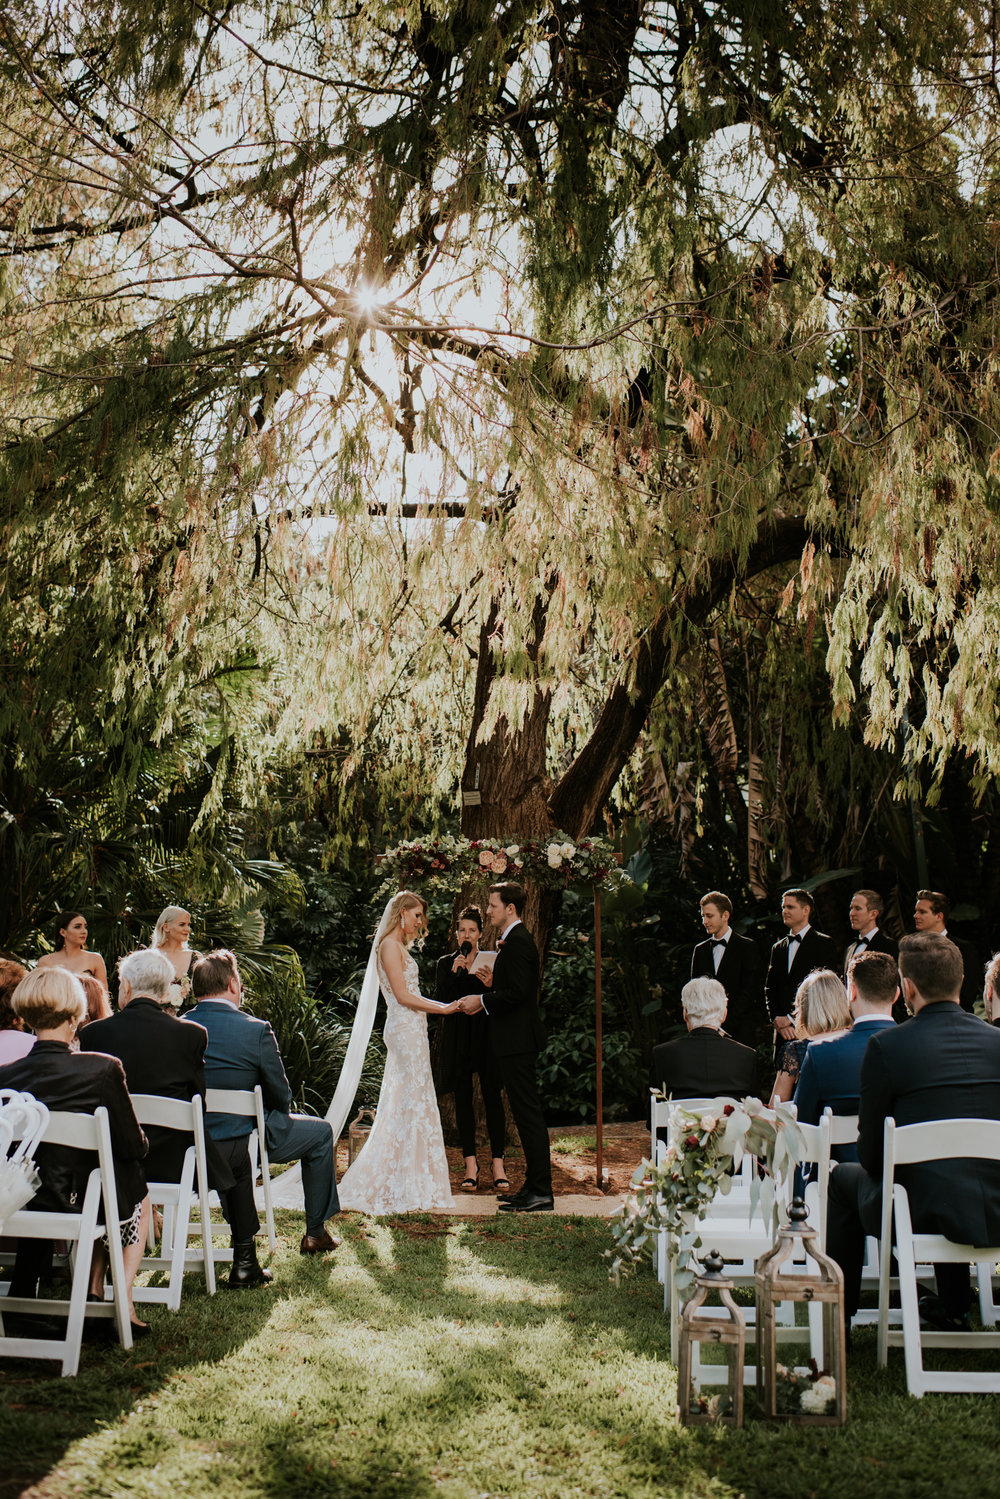 Brisbane Wedding Photographer | Engagement-Elopement Photography | Factory51-City Botantic Gardens Wedding-33.jpg